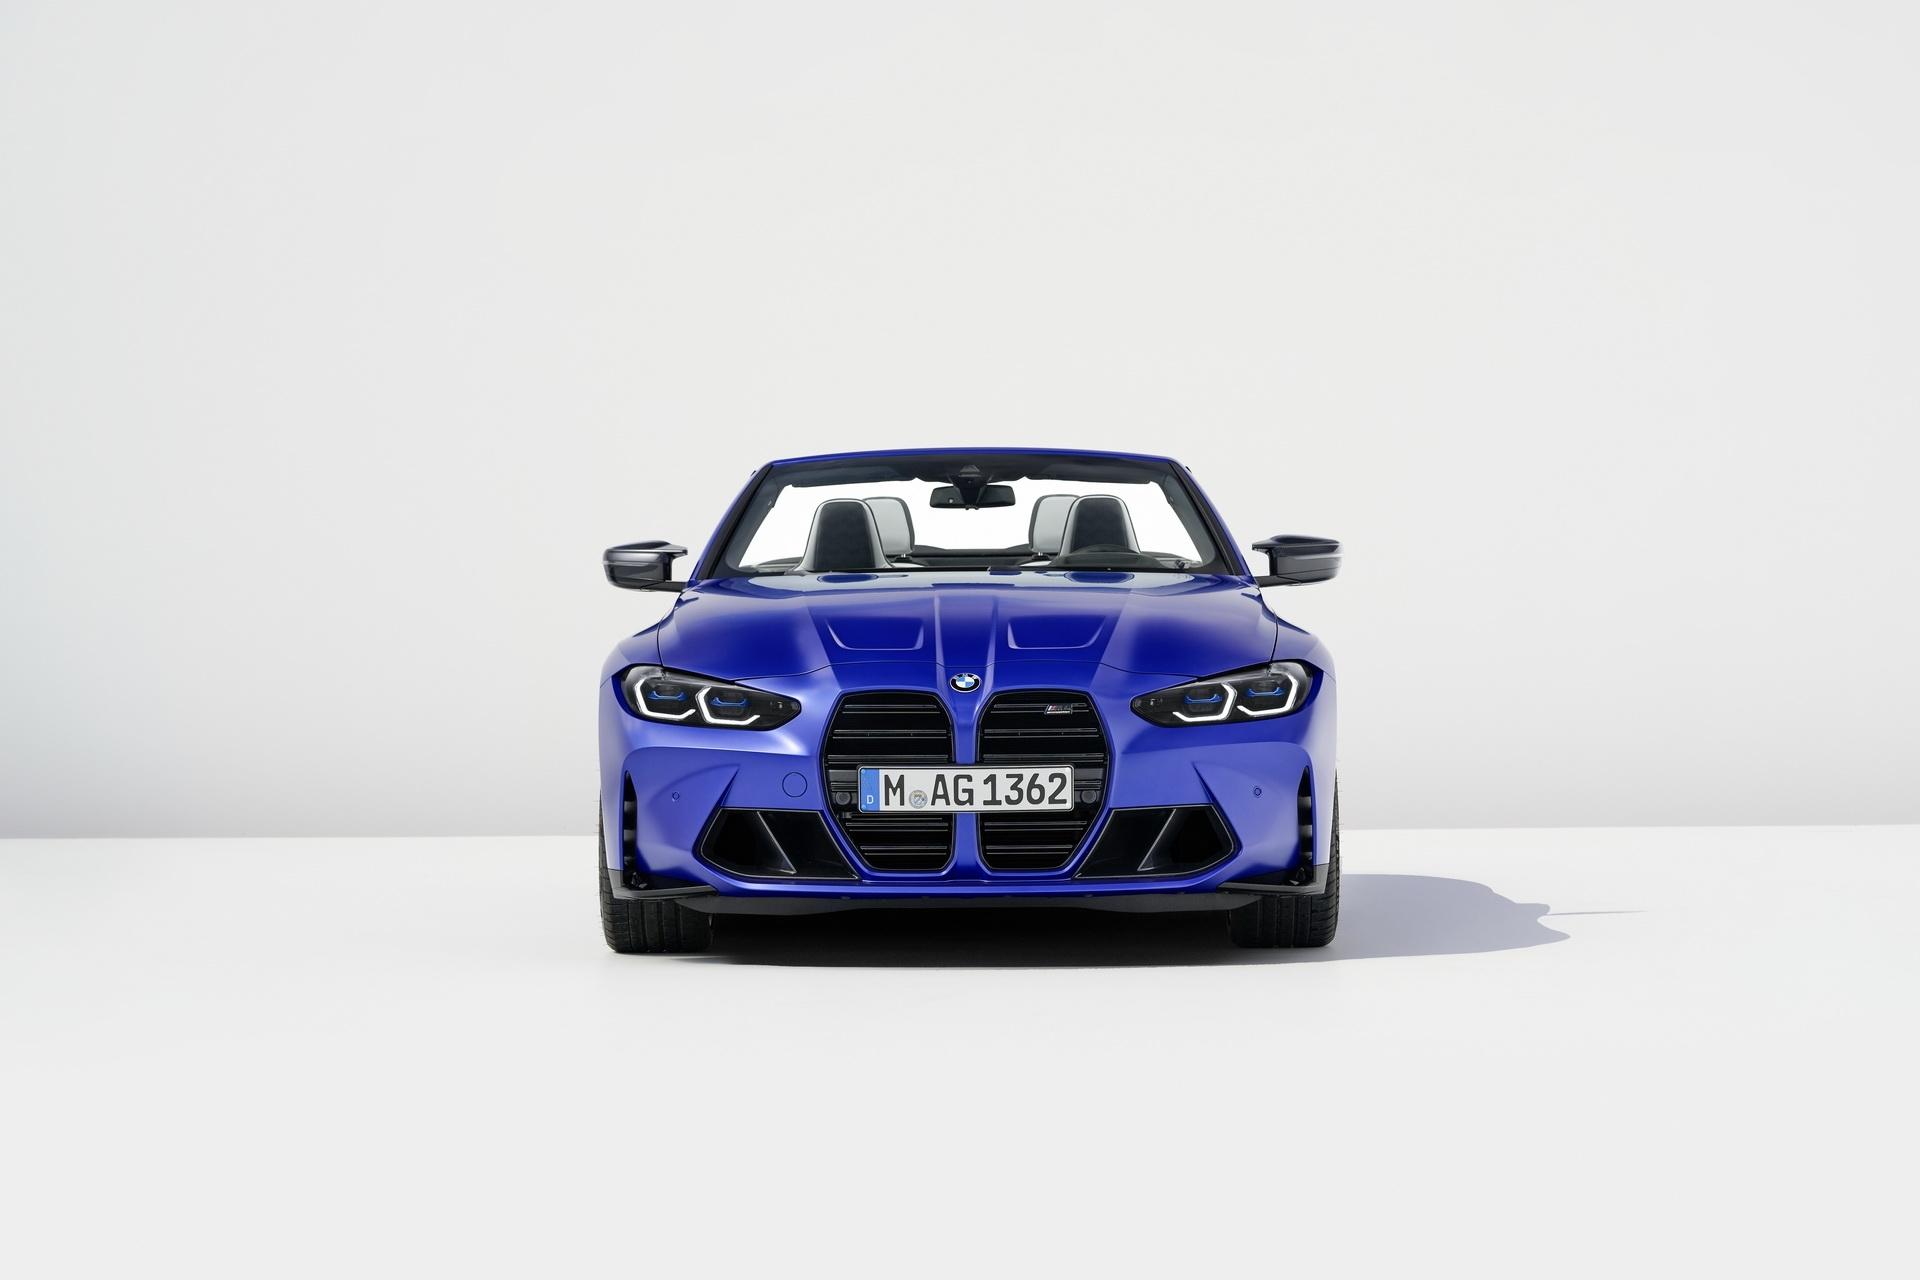 Bmw M4 Competition Cabrio 2021 0521 002